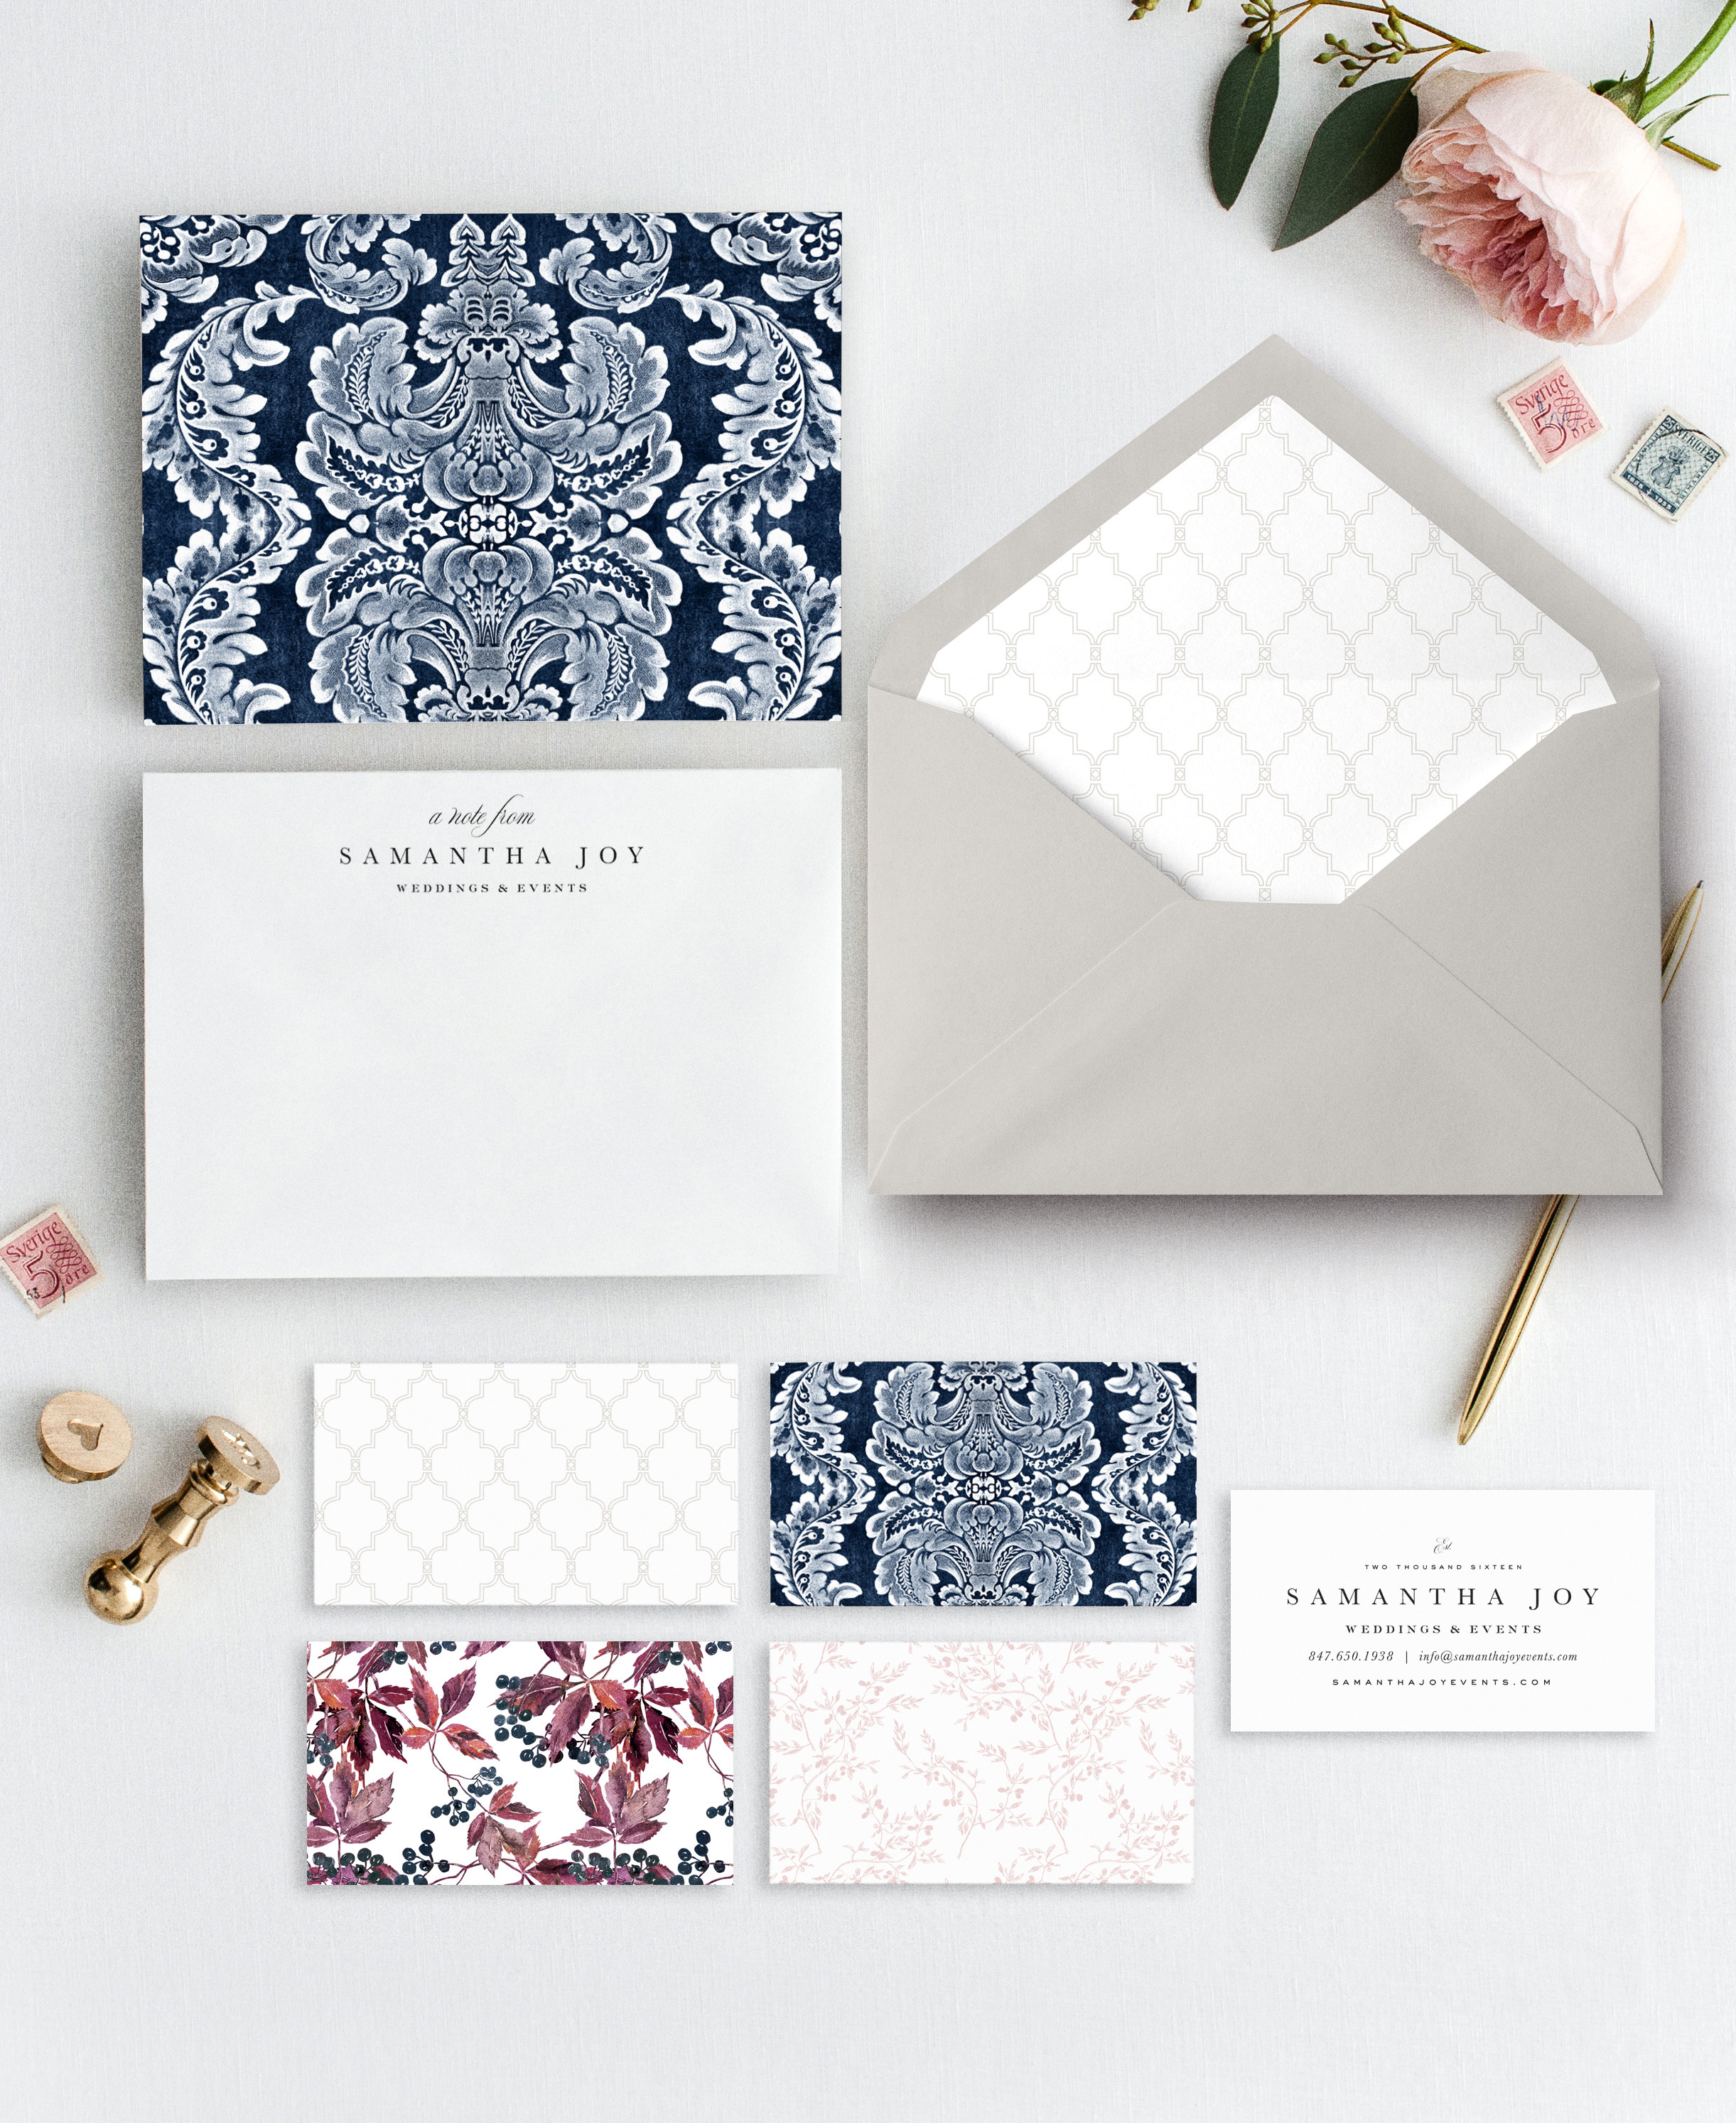 Samantha-Joy-Branding-Stationery-Business-Note-Card-Grey.jpg